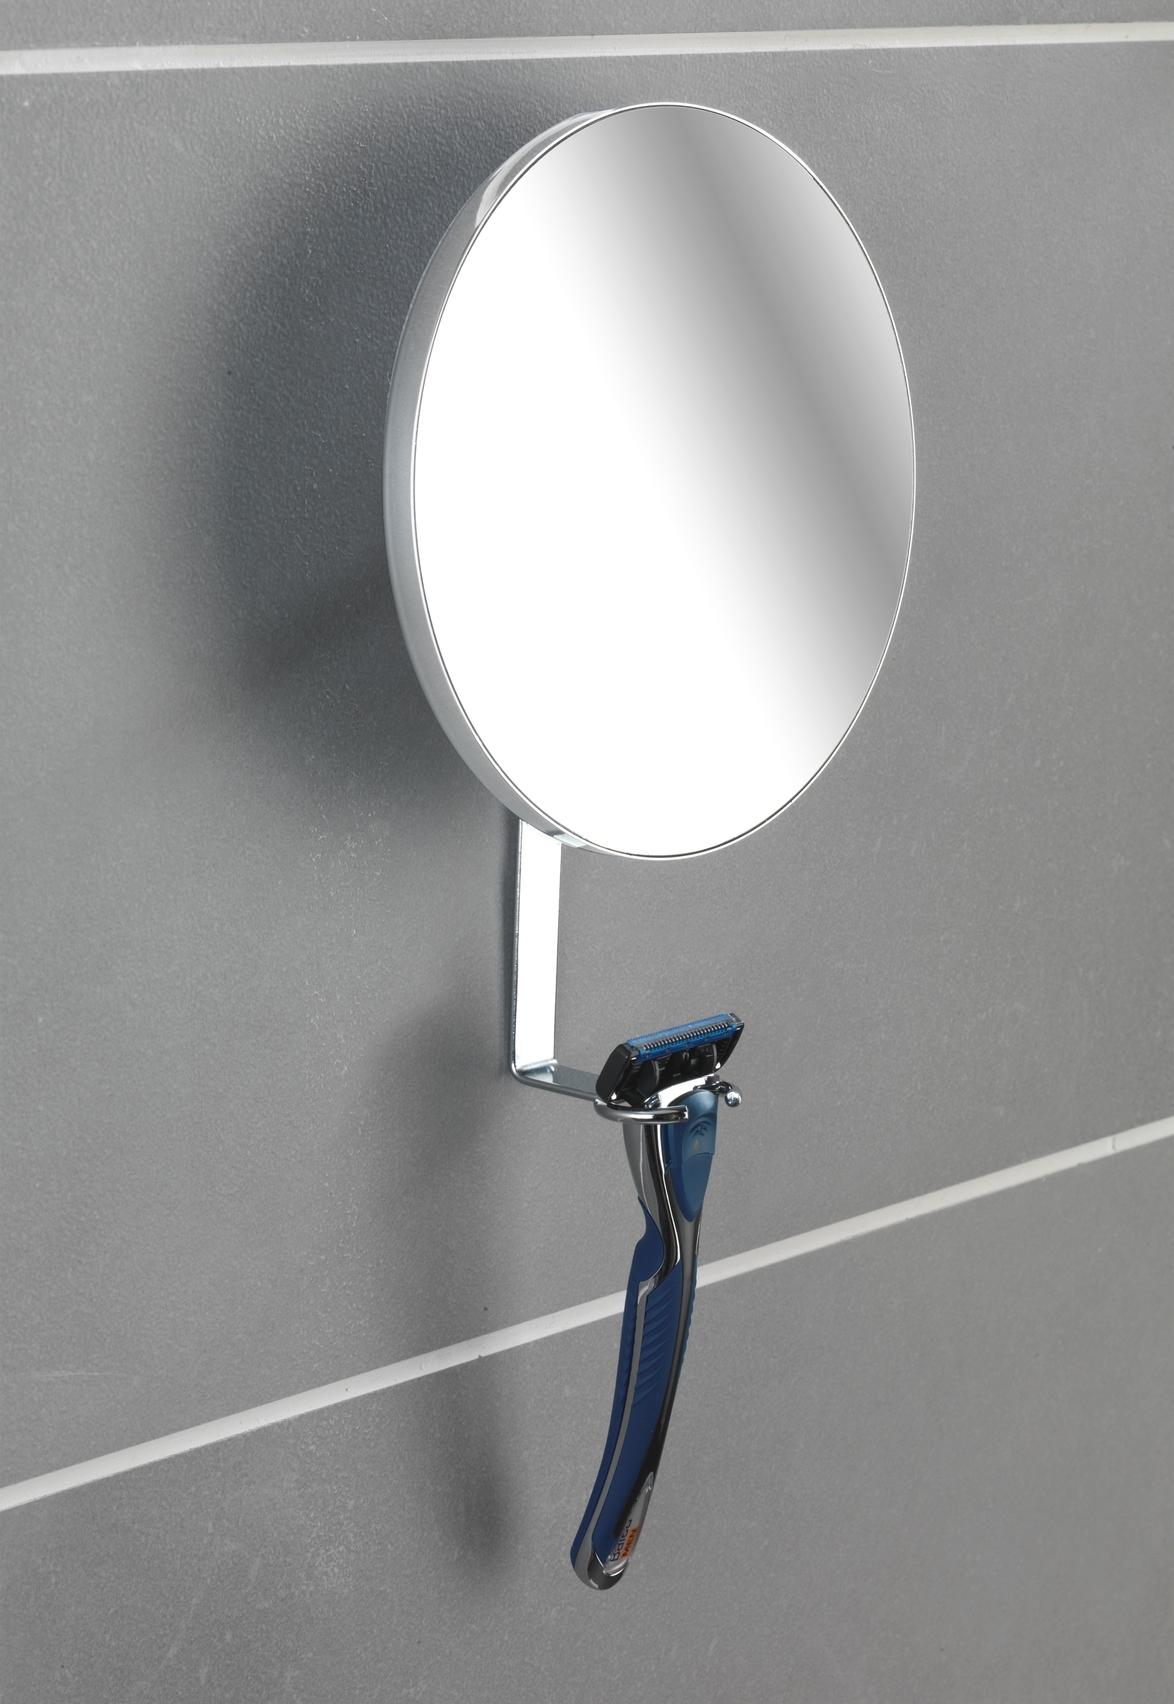 Oglinda cosmetica de perete, cu suport lama de ras, Turbo-Loc Crom, Ø17xA4xH23 cm imagine